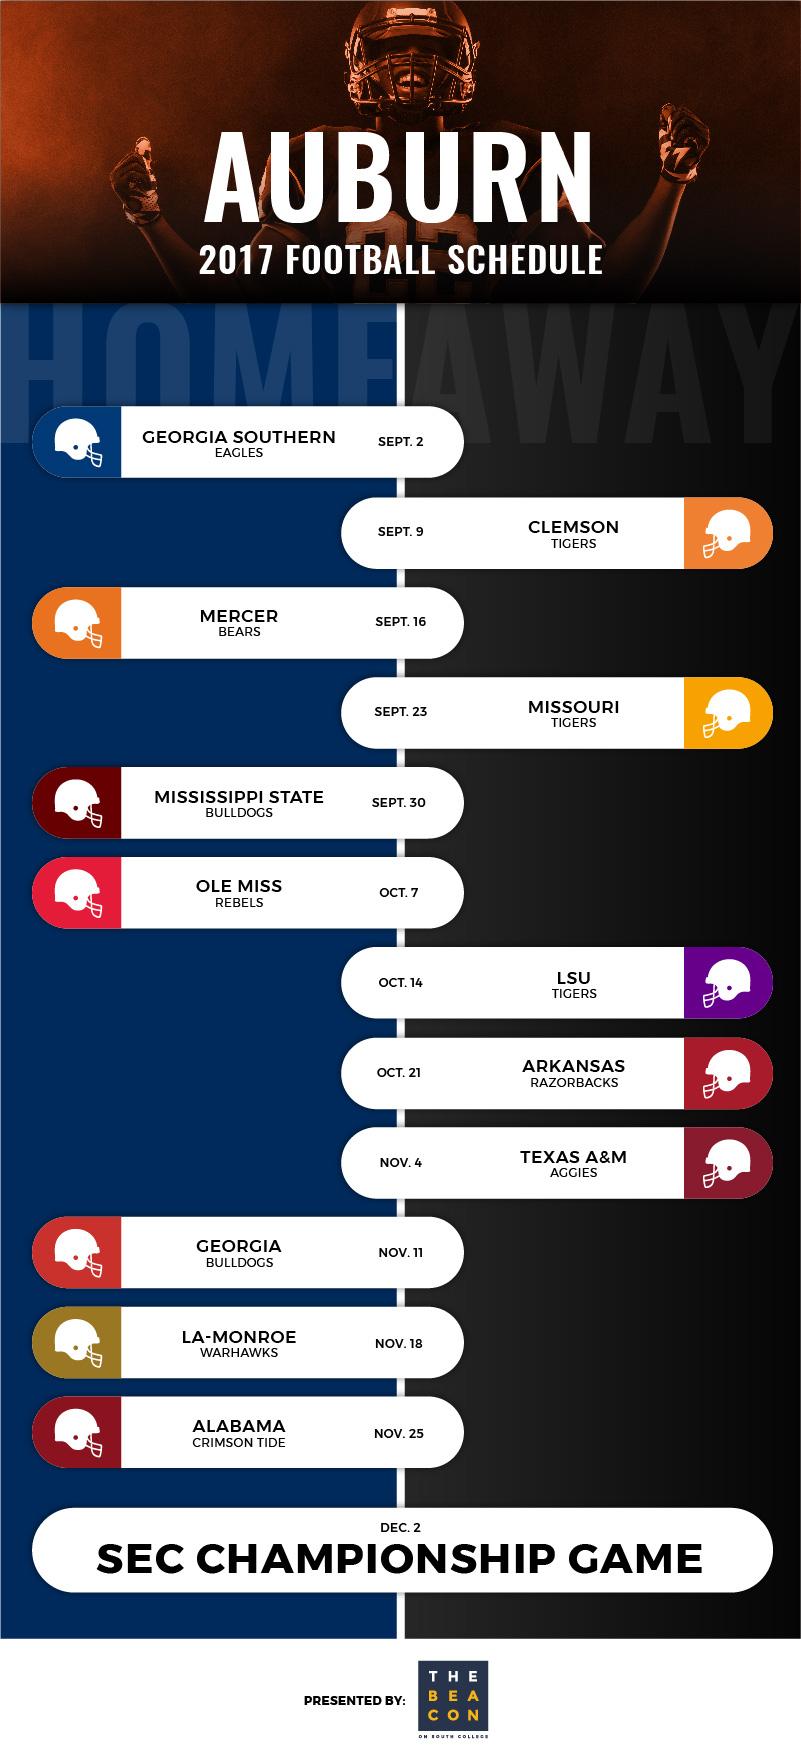 auburn tigers football schedule (infographic)